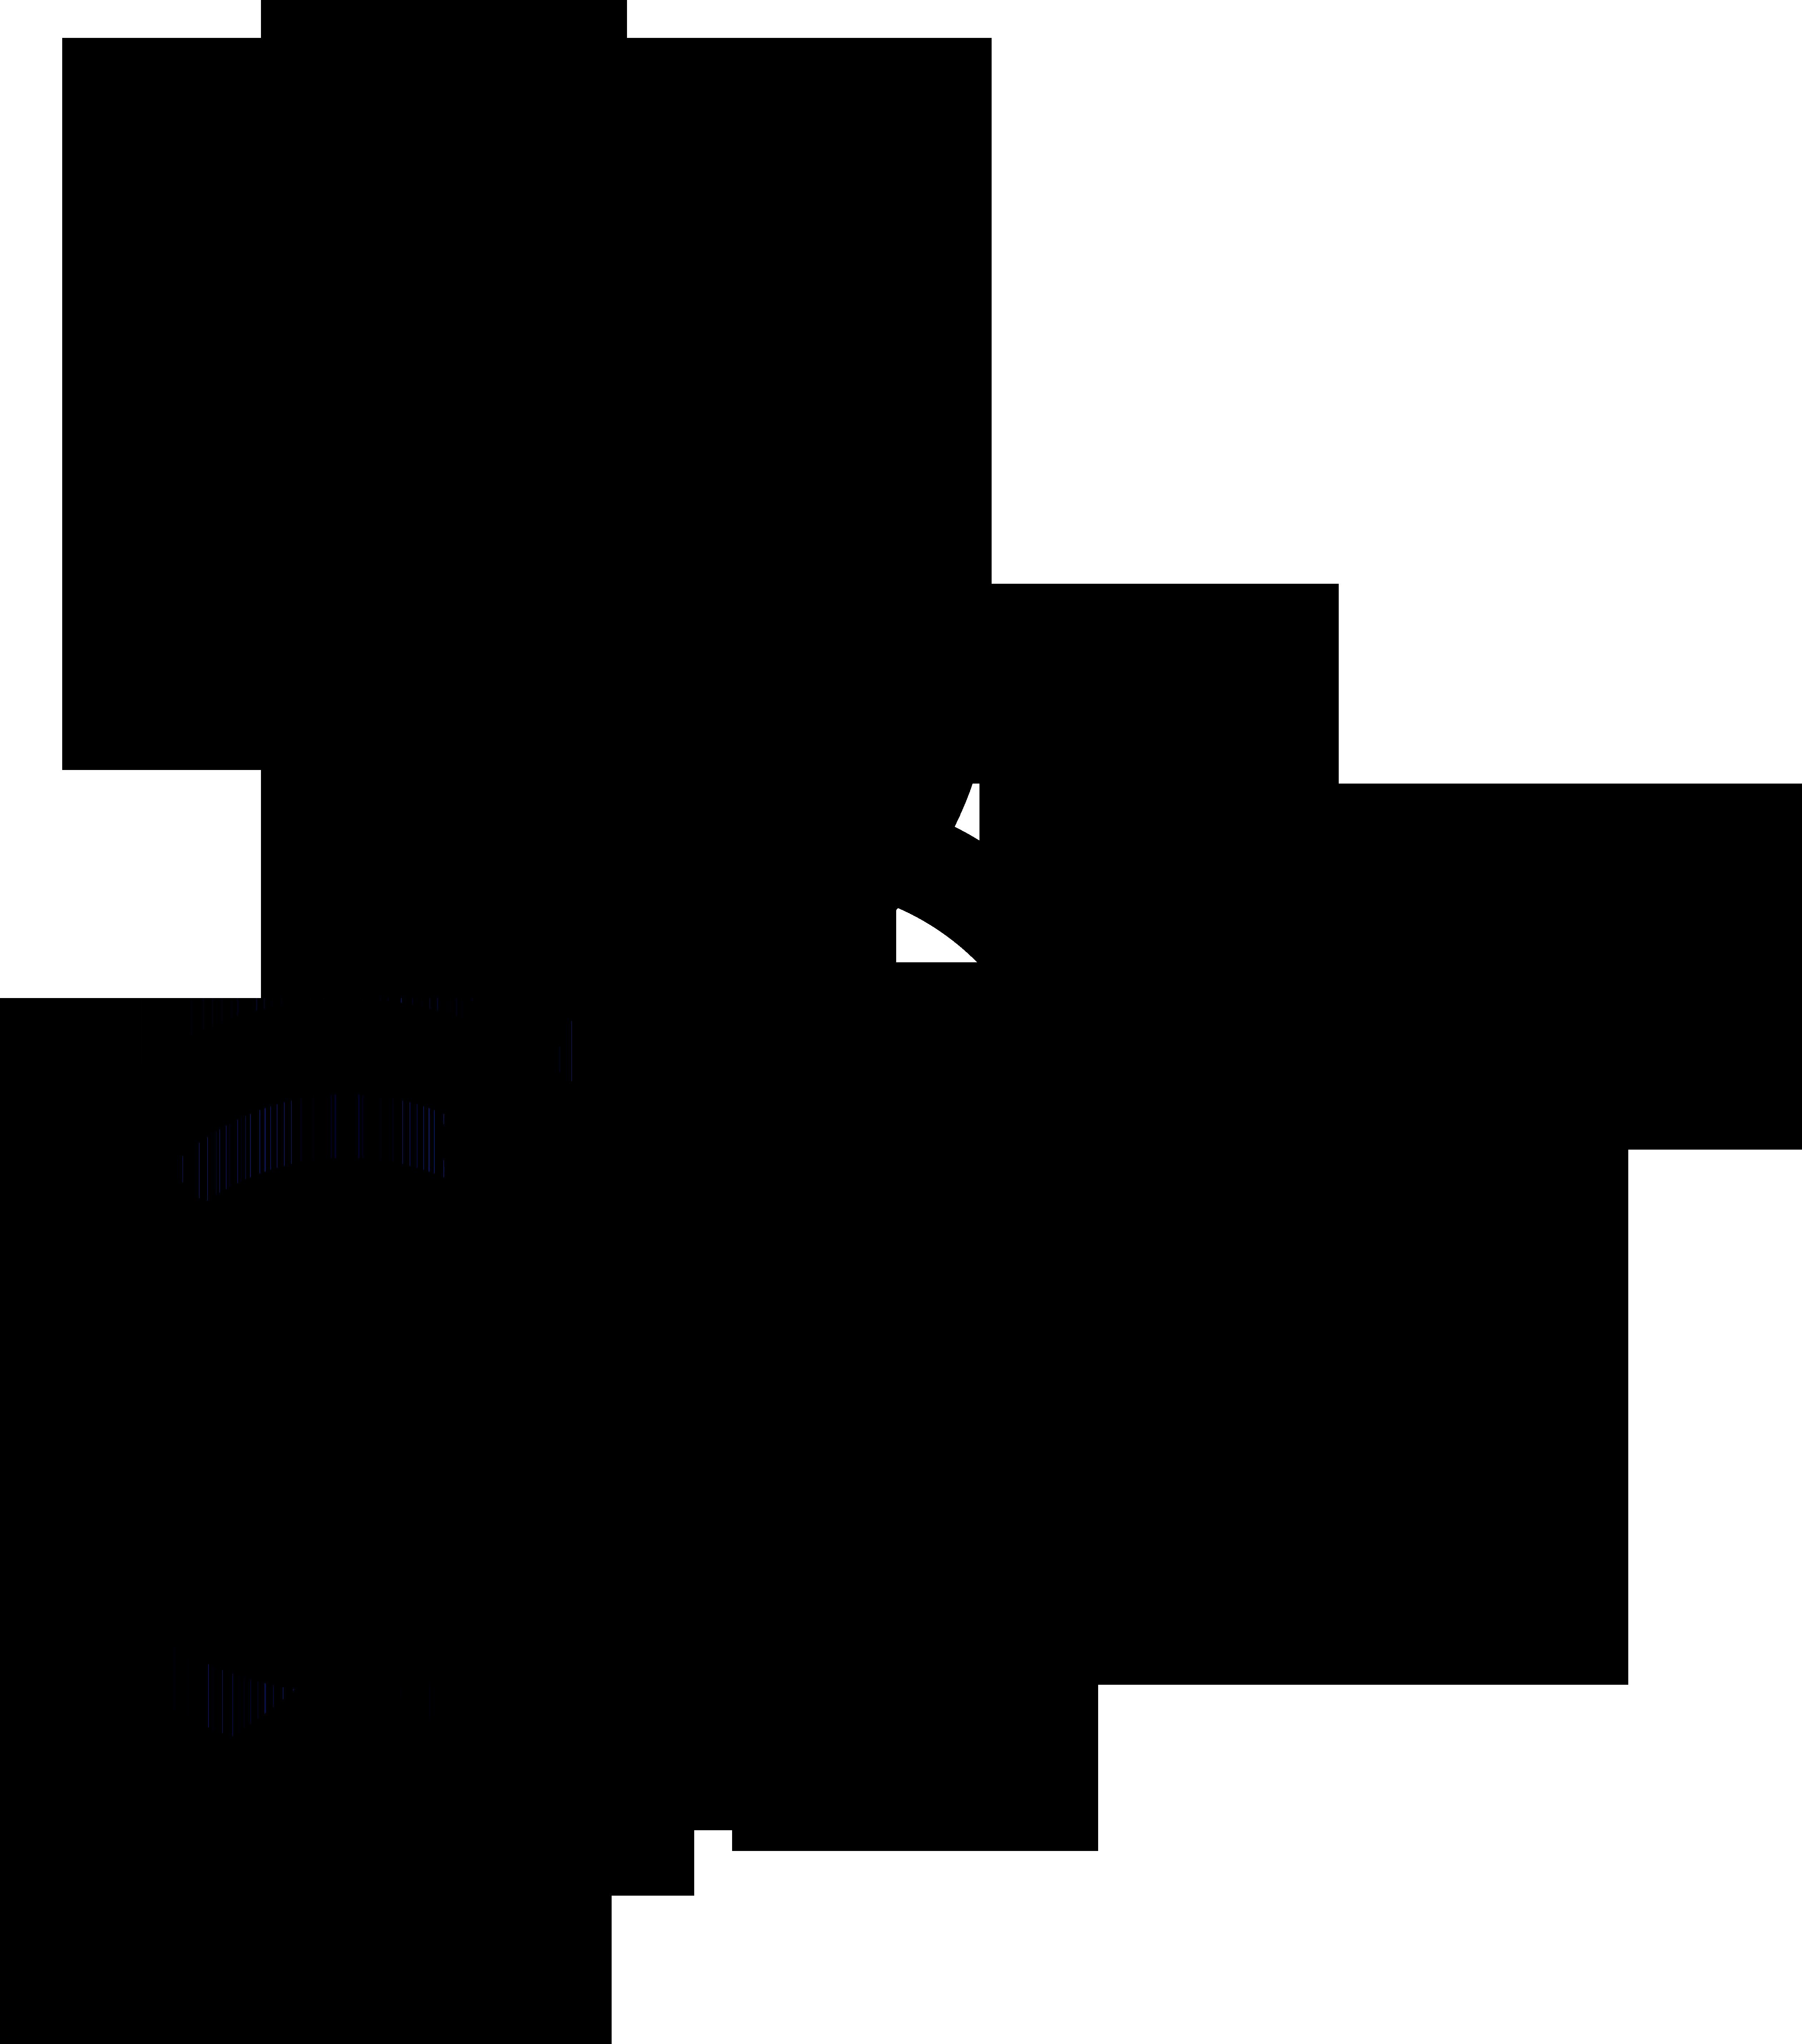 Nonbinary man and woman symbol interlocked with nonbinary, Venus and Mars symbols.